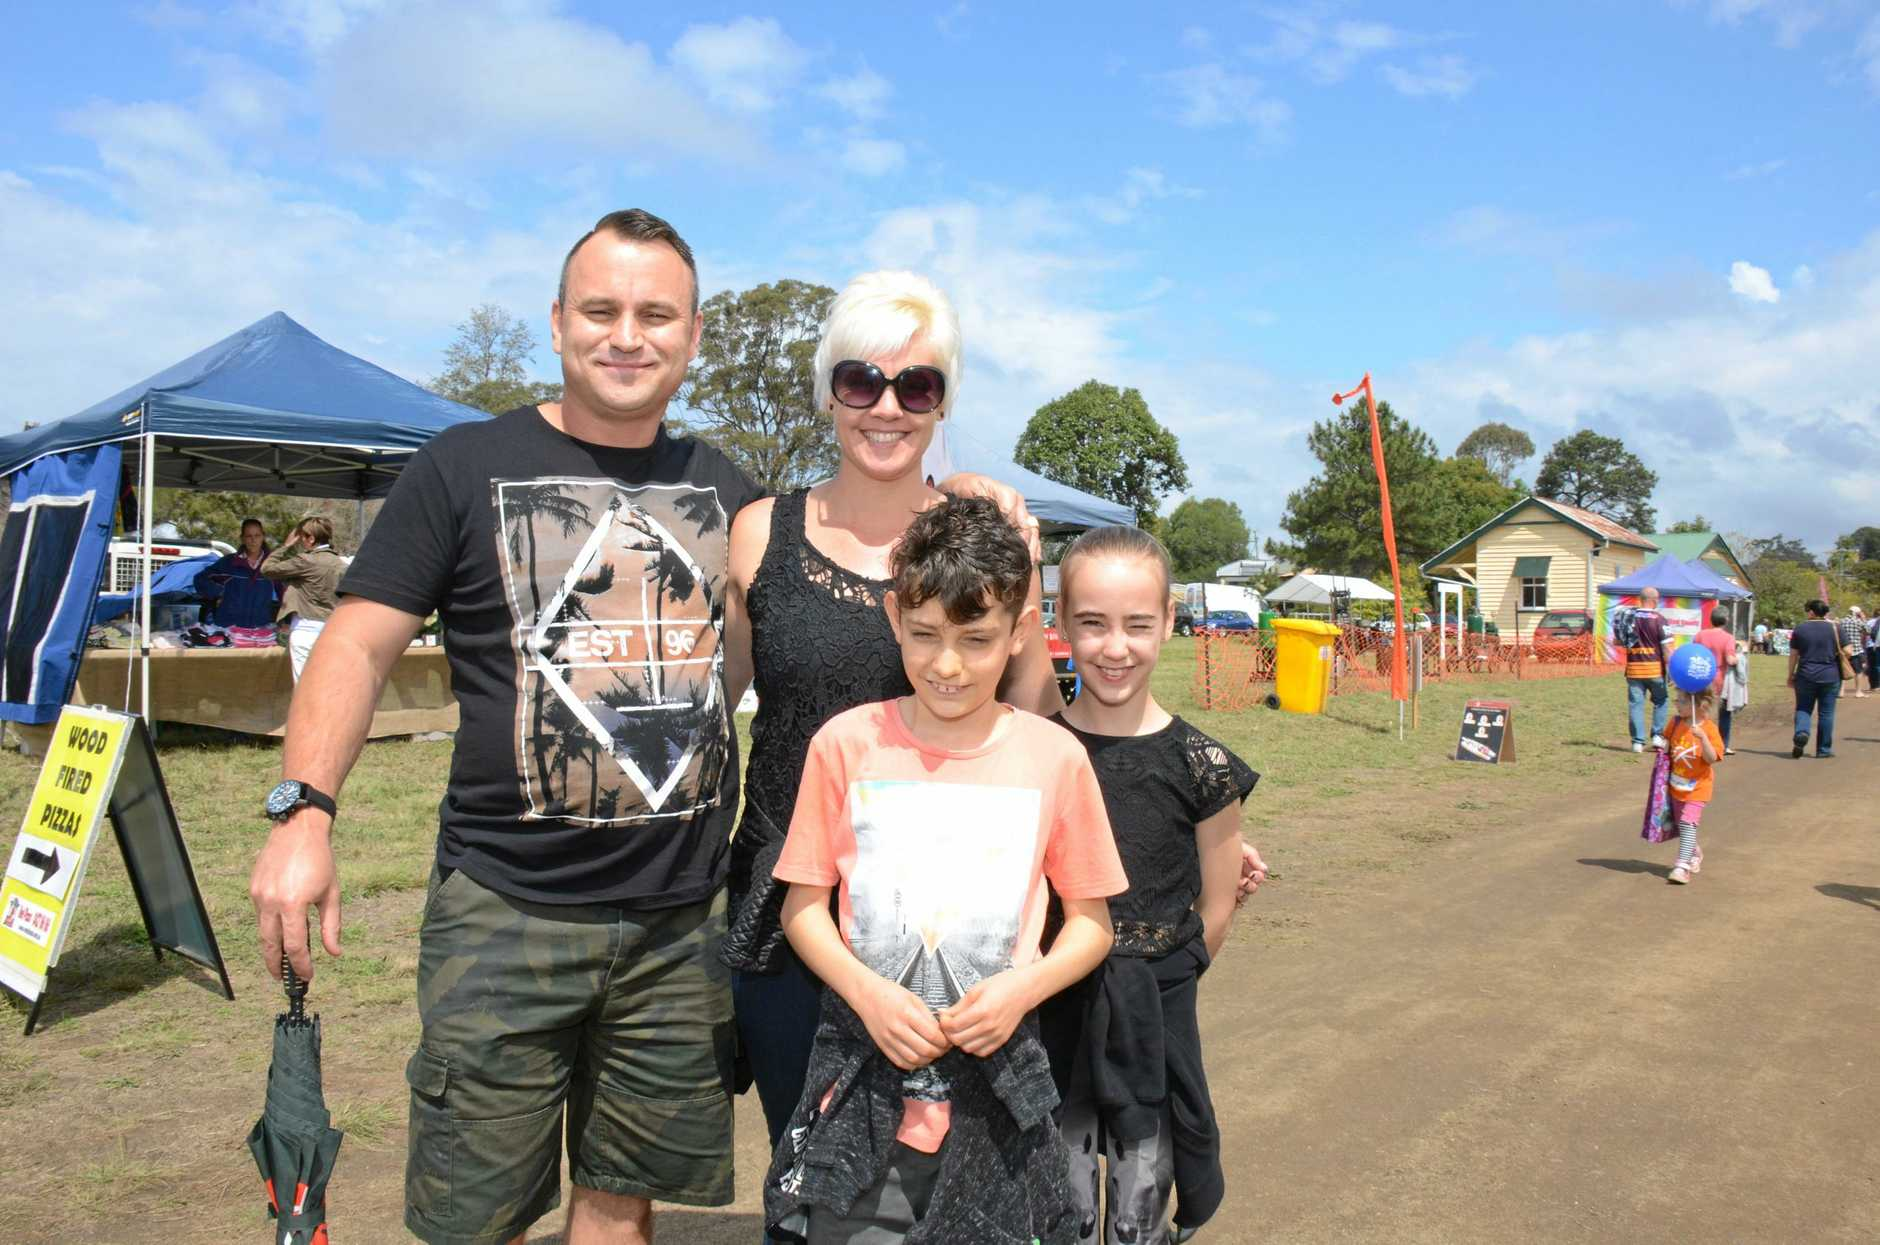 Sean, Marti, Jhett and Xanthe Dahlin at the Blackbutt Avocado Festival on September 12.